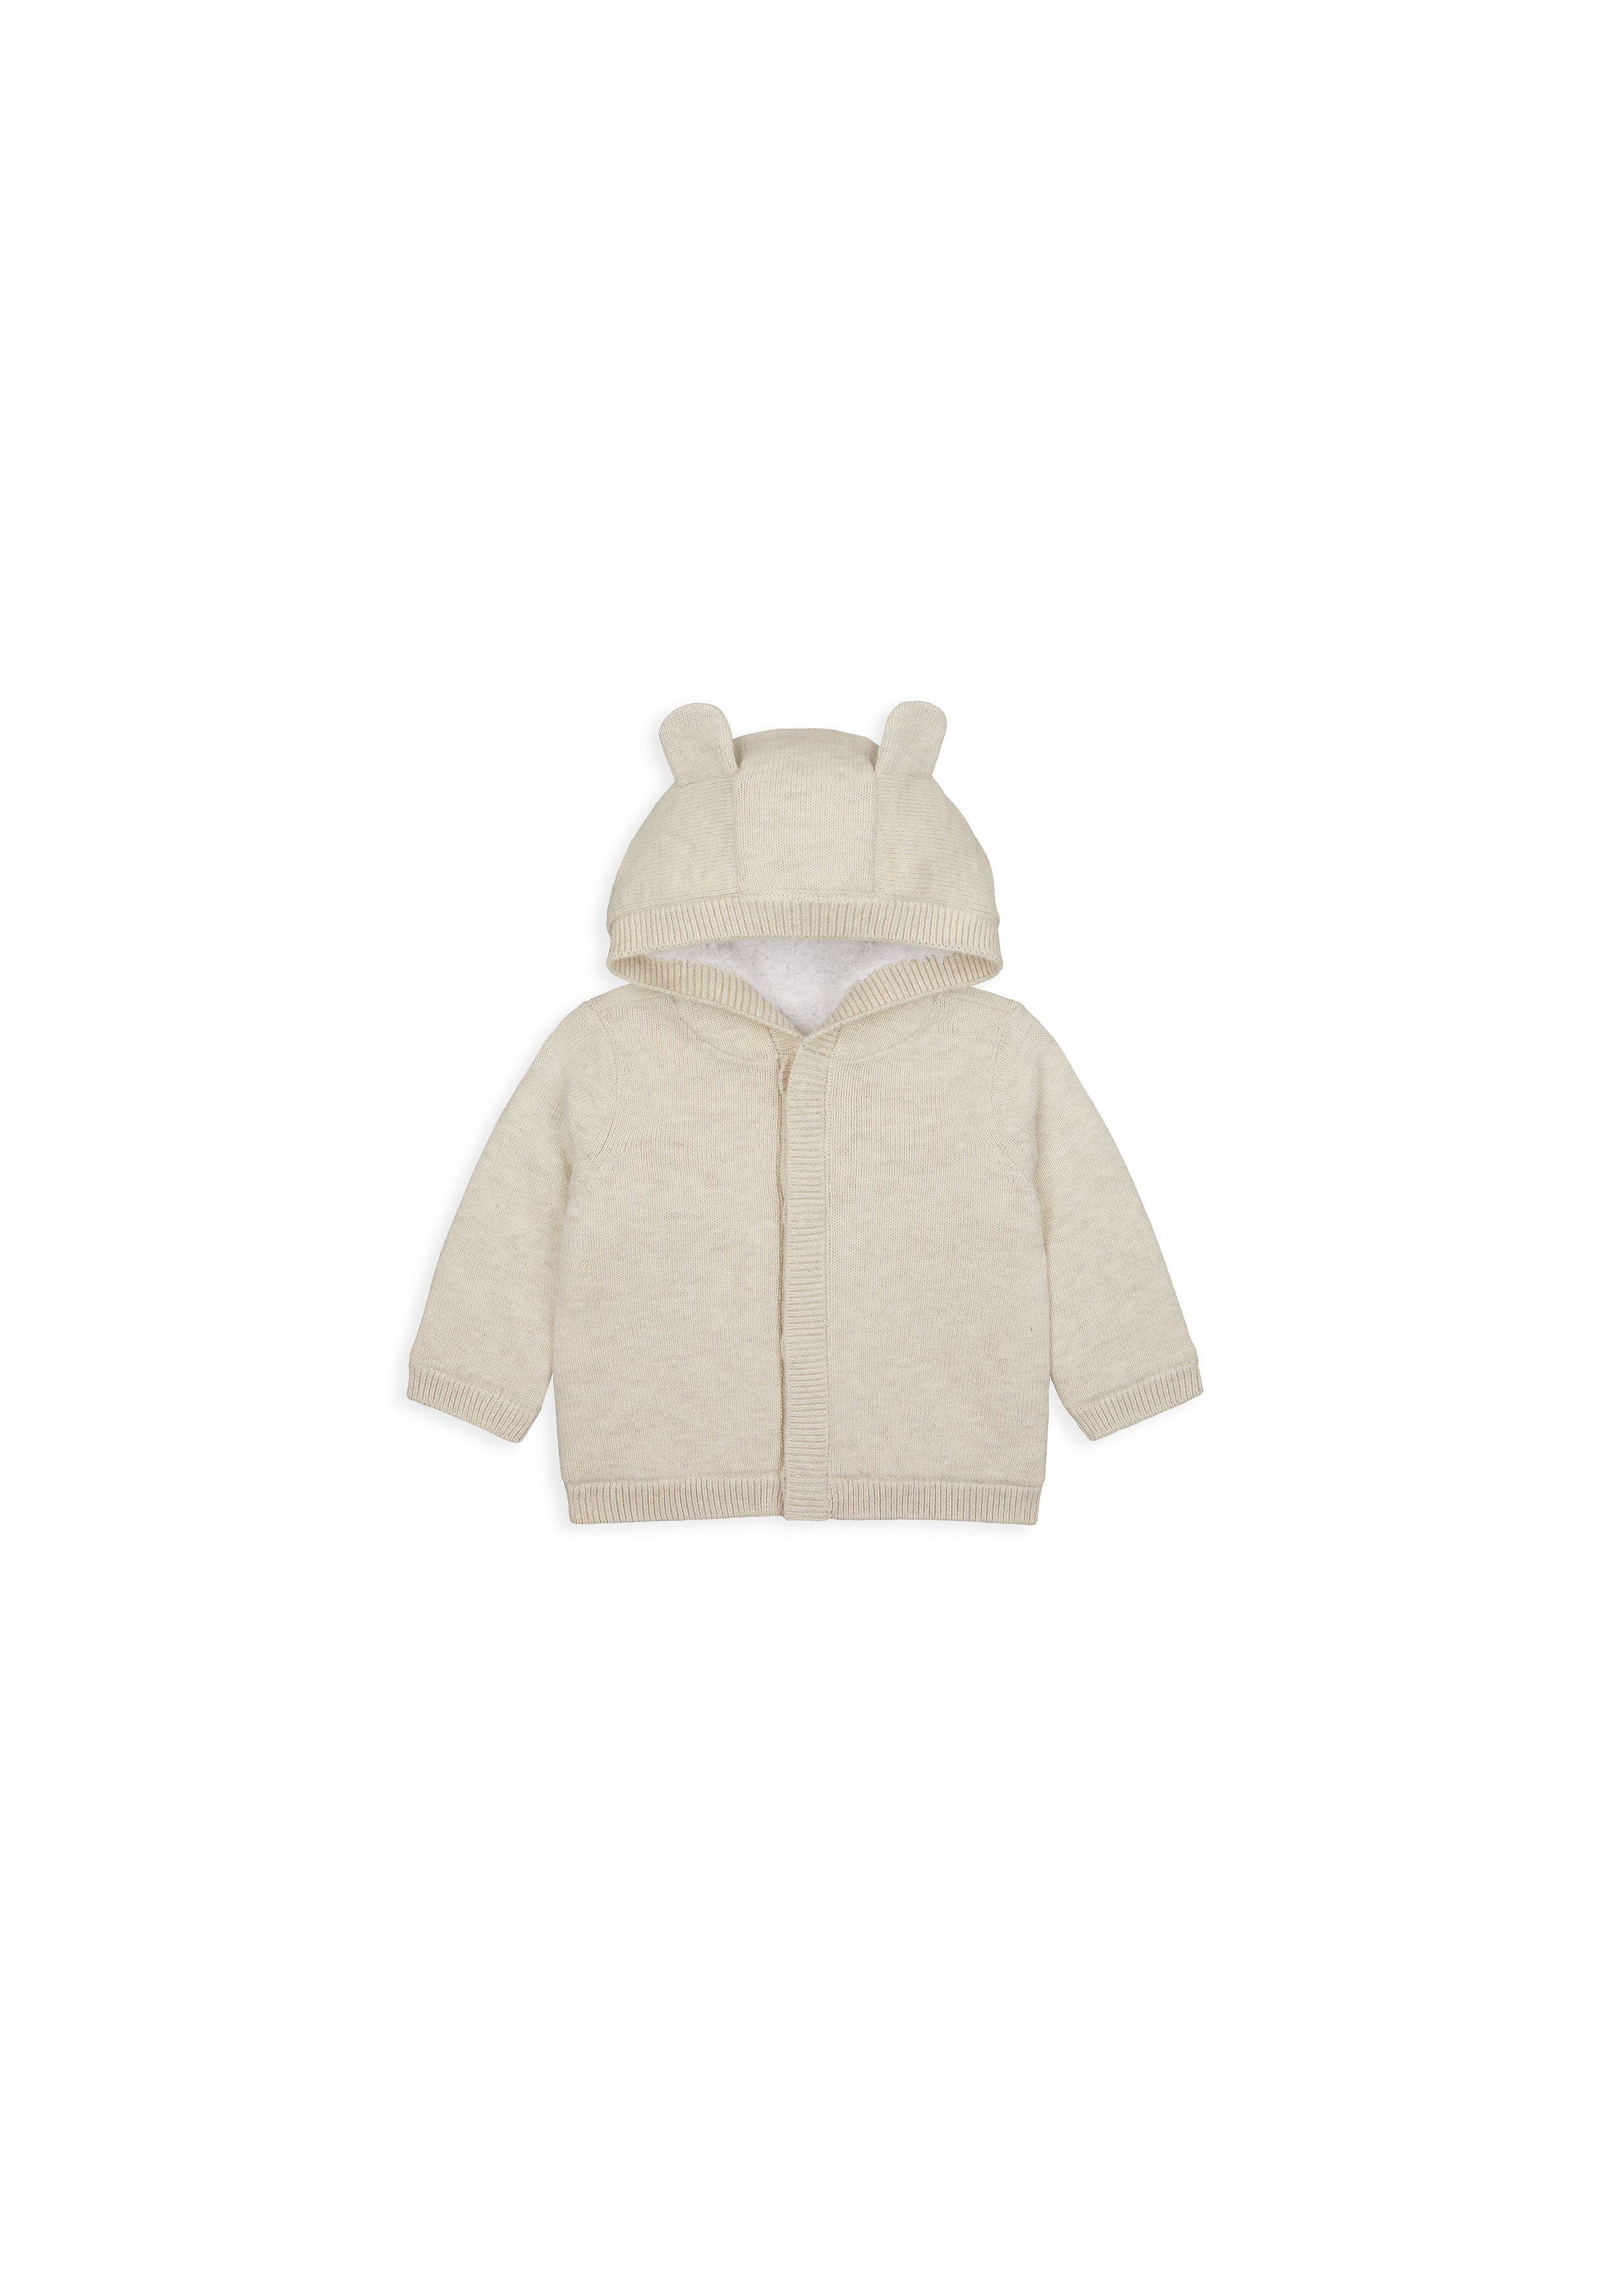 Mothercare | Unisex Full Sleeves Hooded Cardigan 3D Ear Details - Beige